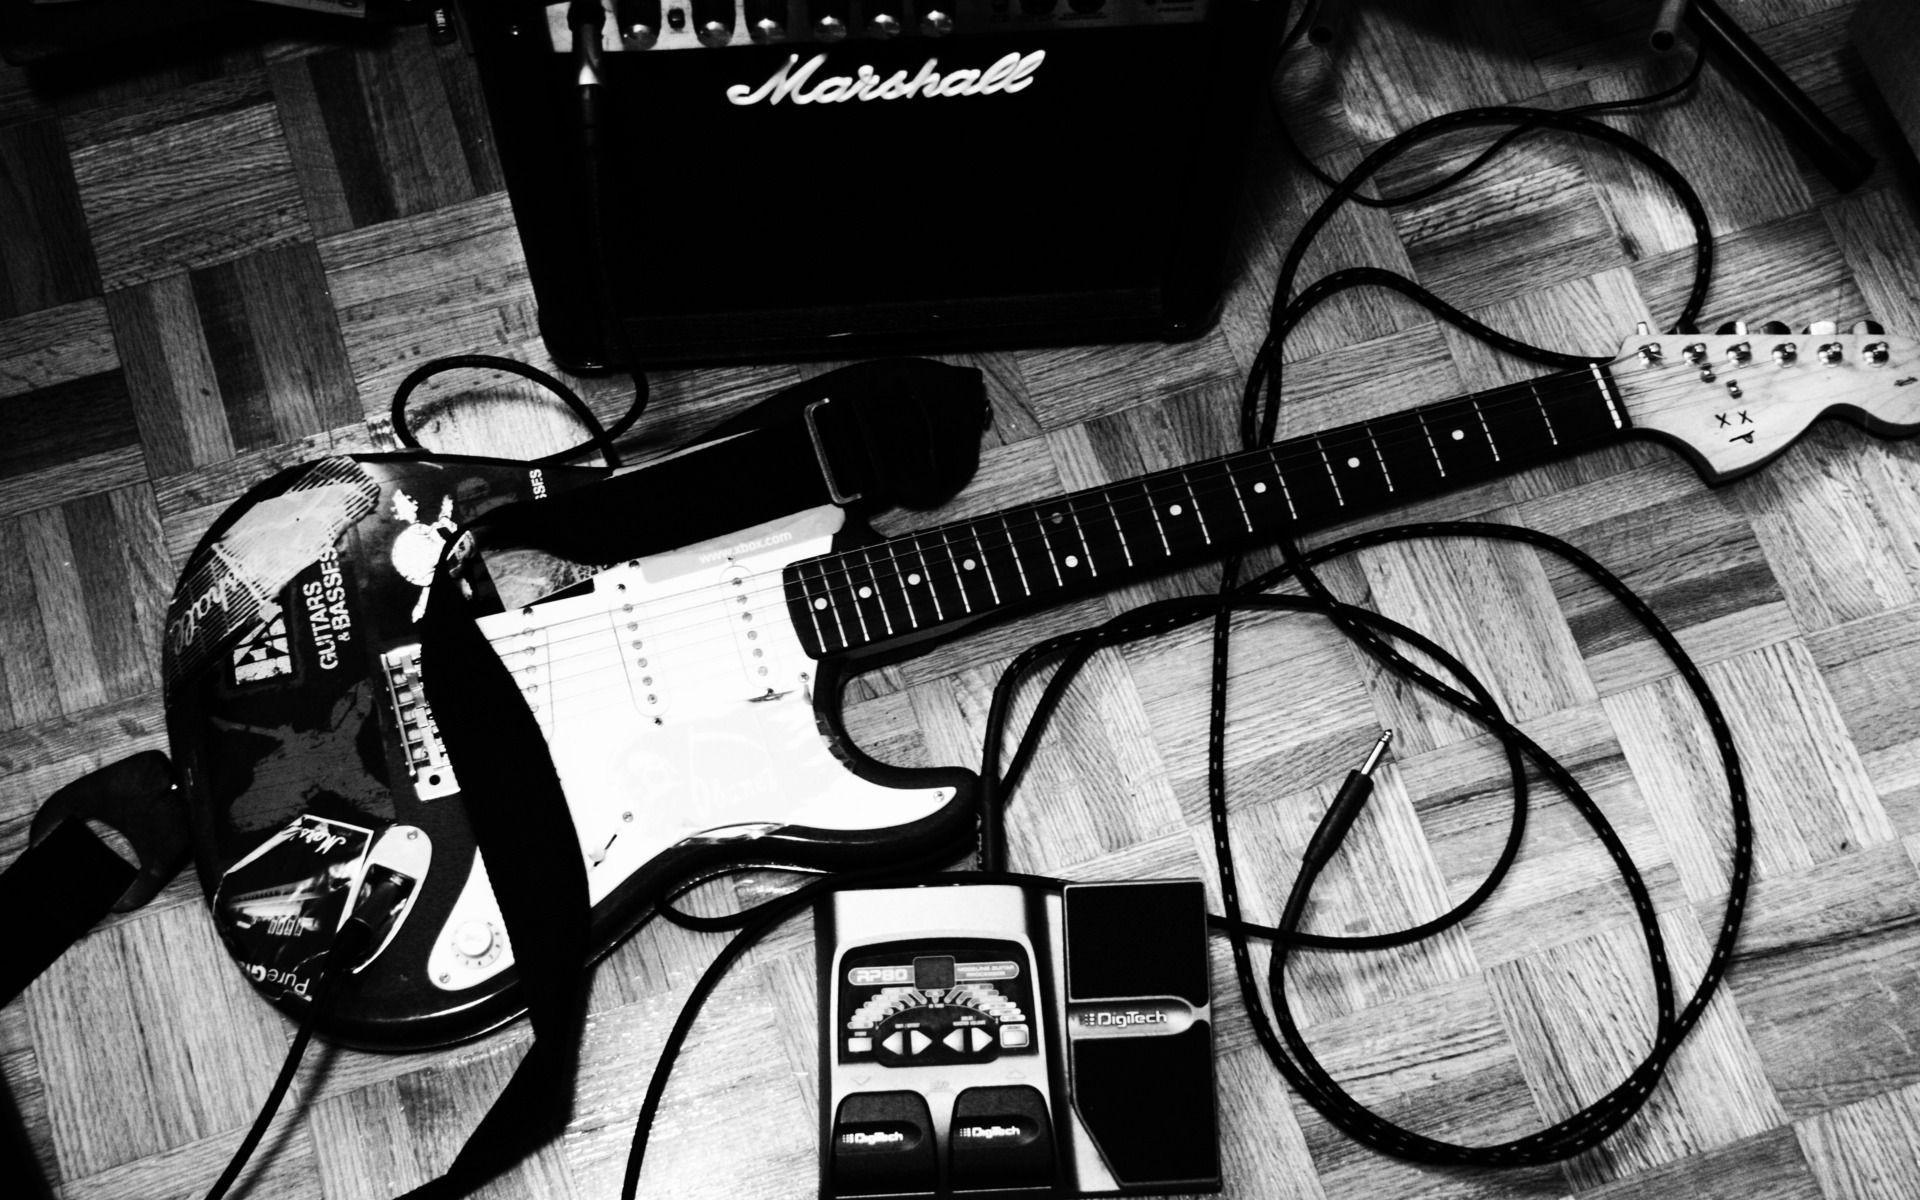 Martin Guitar Desktop Wallpaper | HD Wallpapers | Pinterest | Hd wallpaper,  Wallpaper and Wallpaper backgrounds